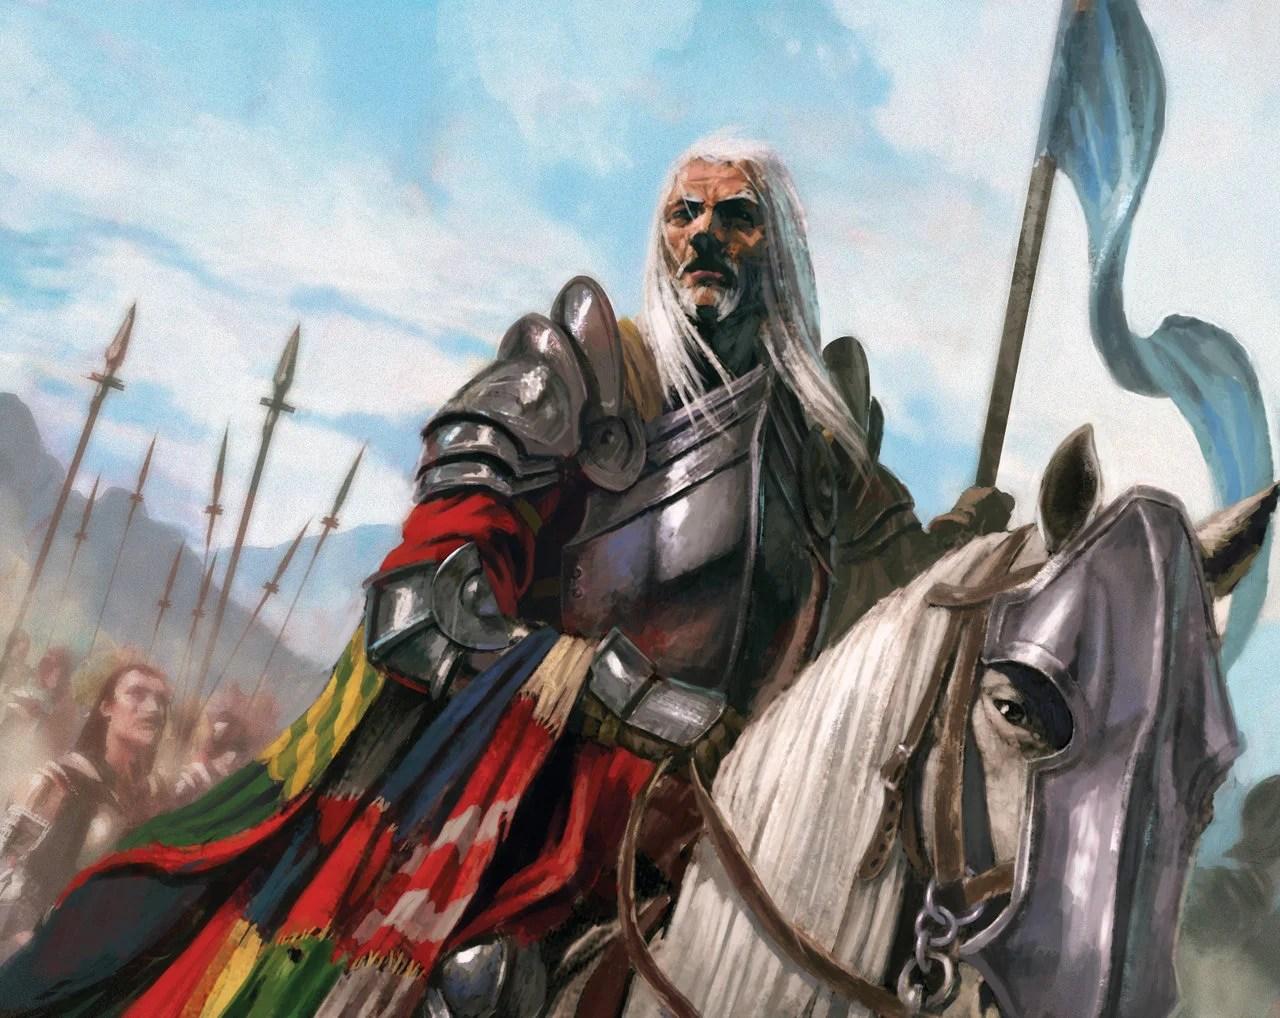 https://i1.wp.com/awoiaf.westeros.org/images/2/27/DiegoGisbertLlorens_tattered_princeII.jpg